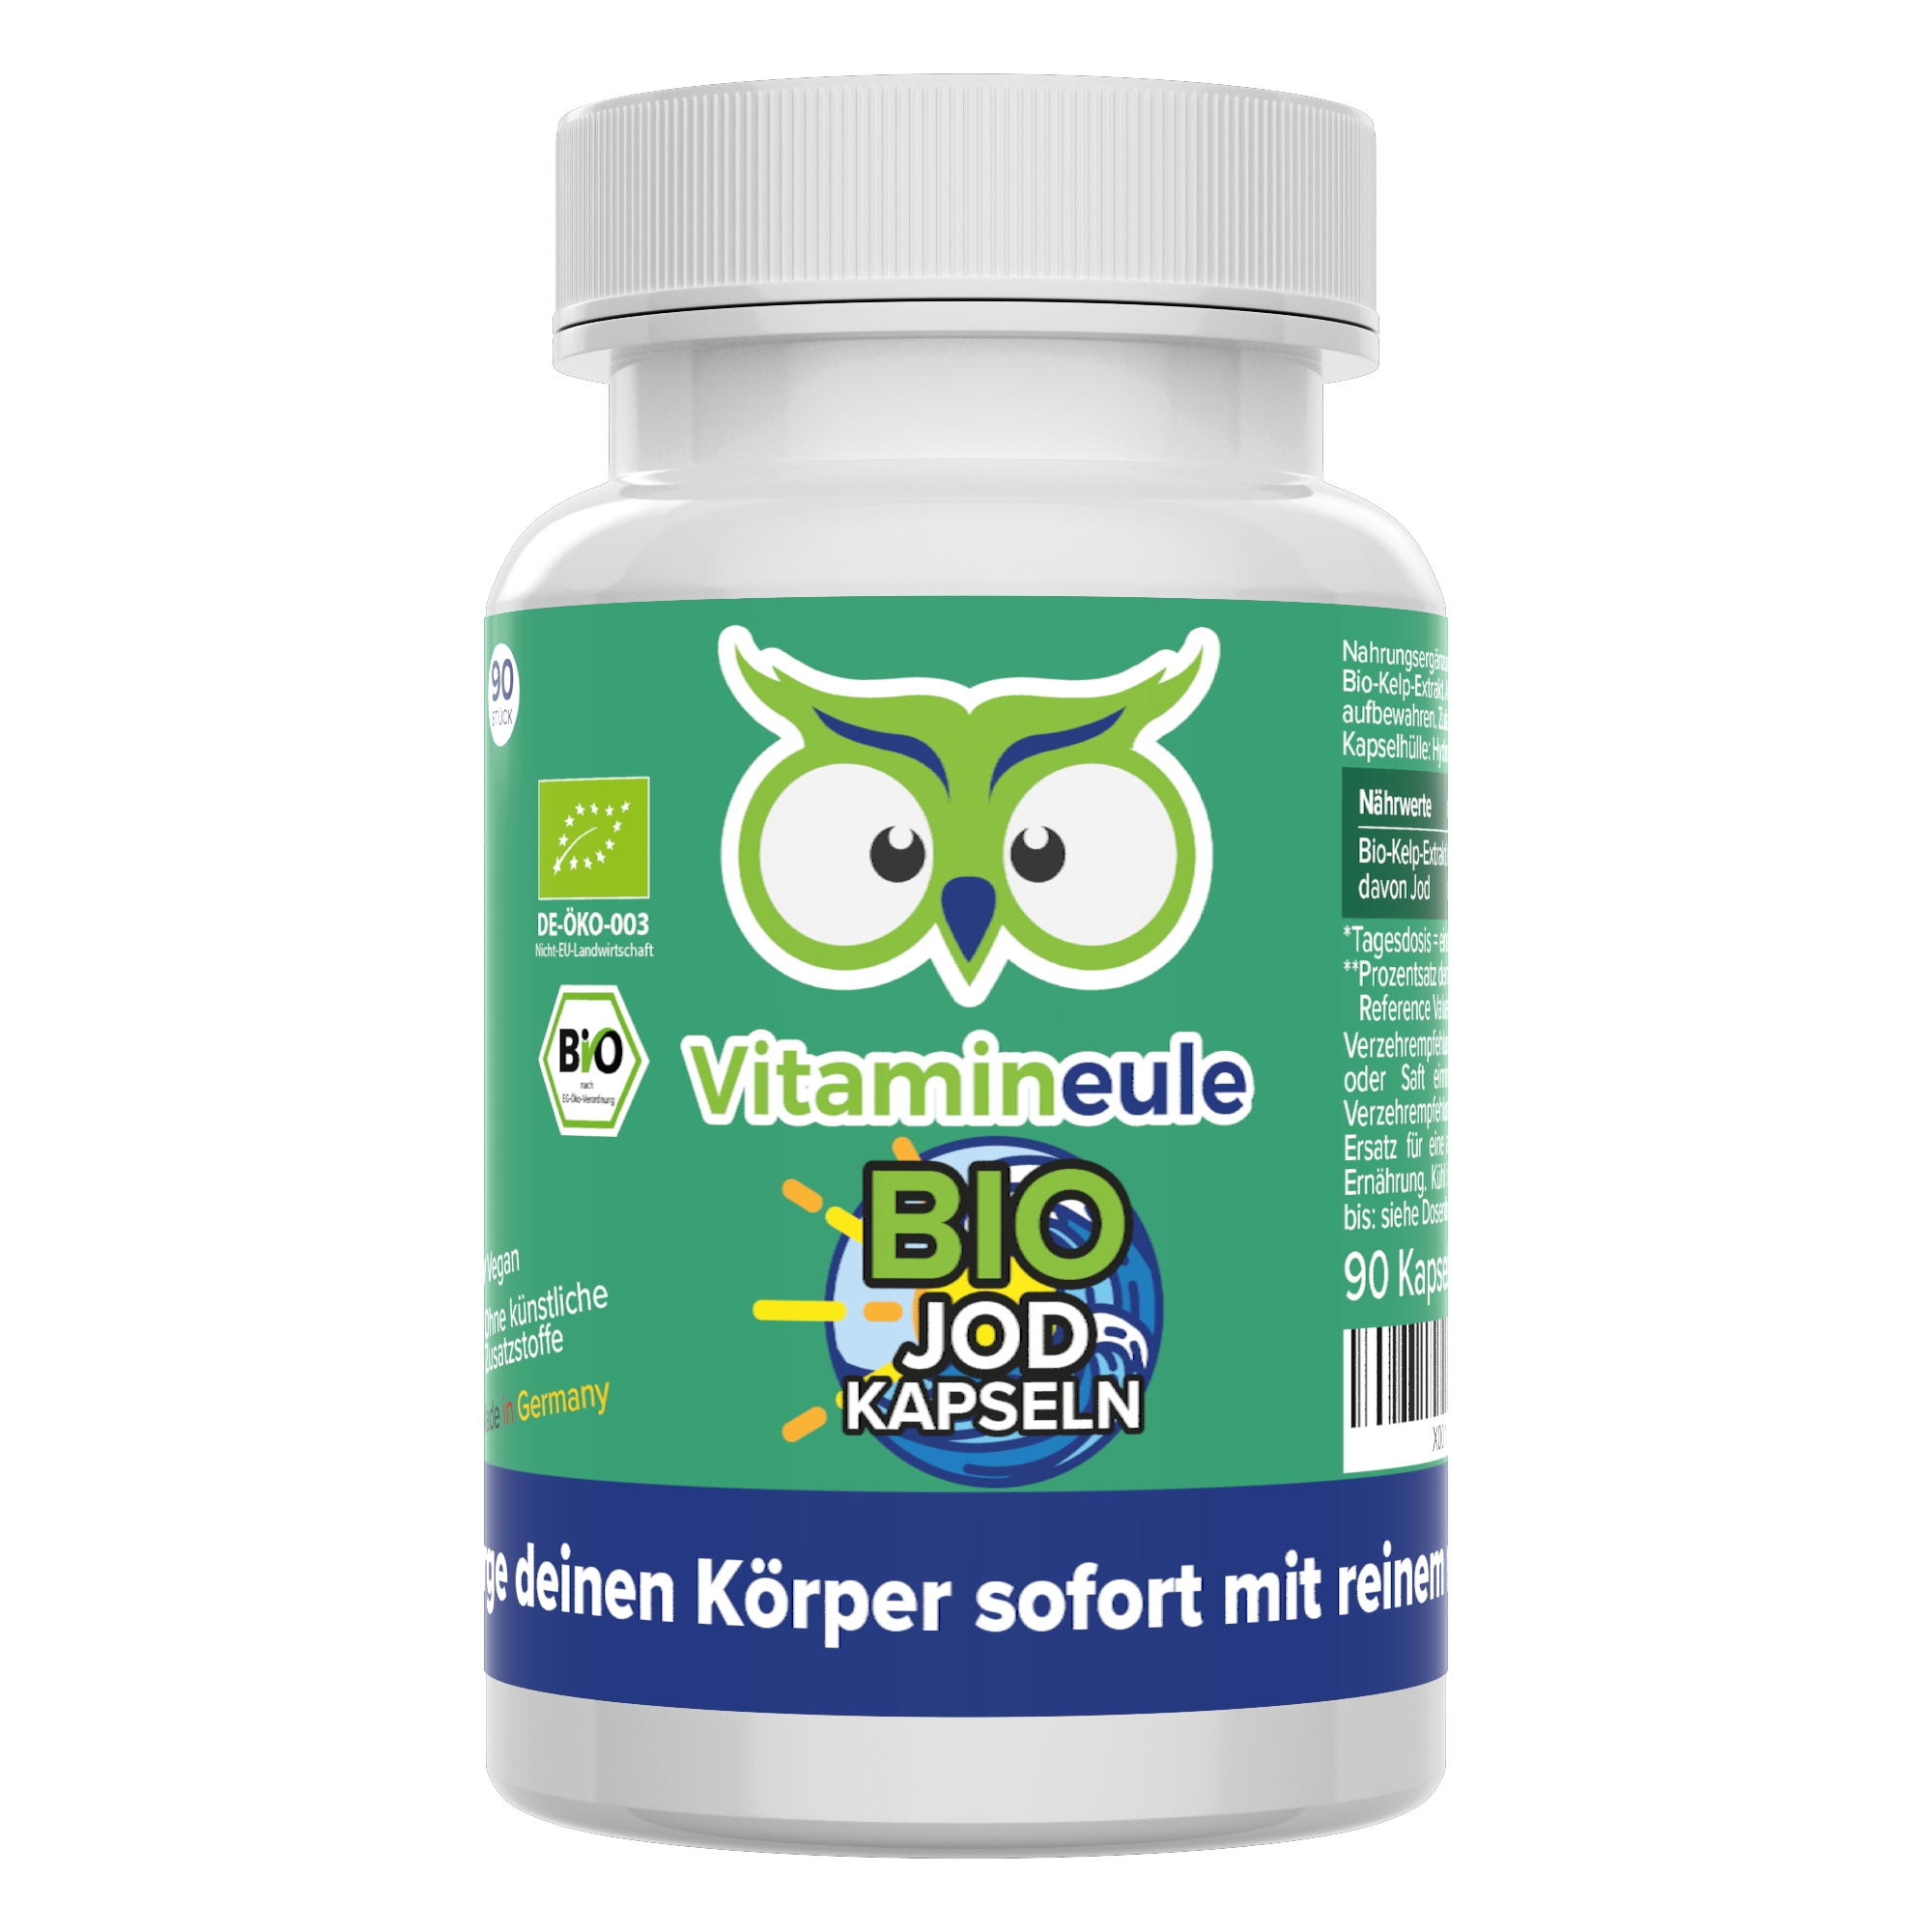 Bio Jod Kapseln von Vitamineule